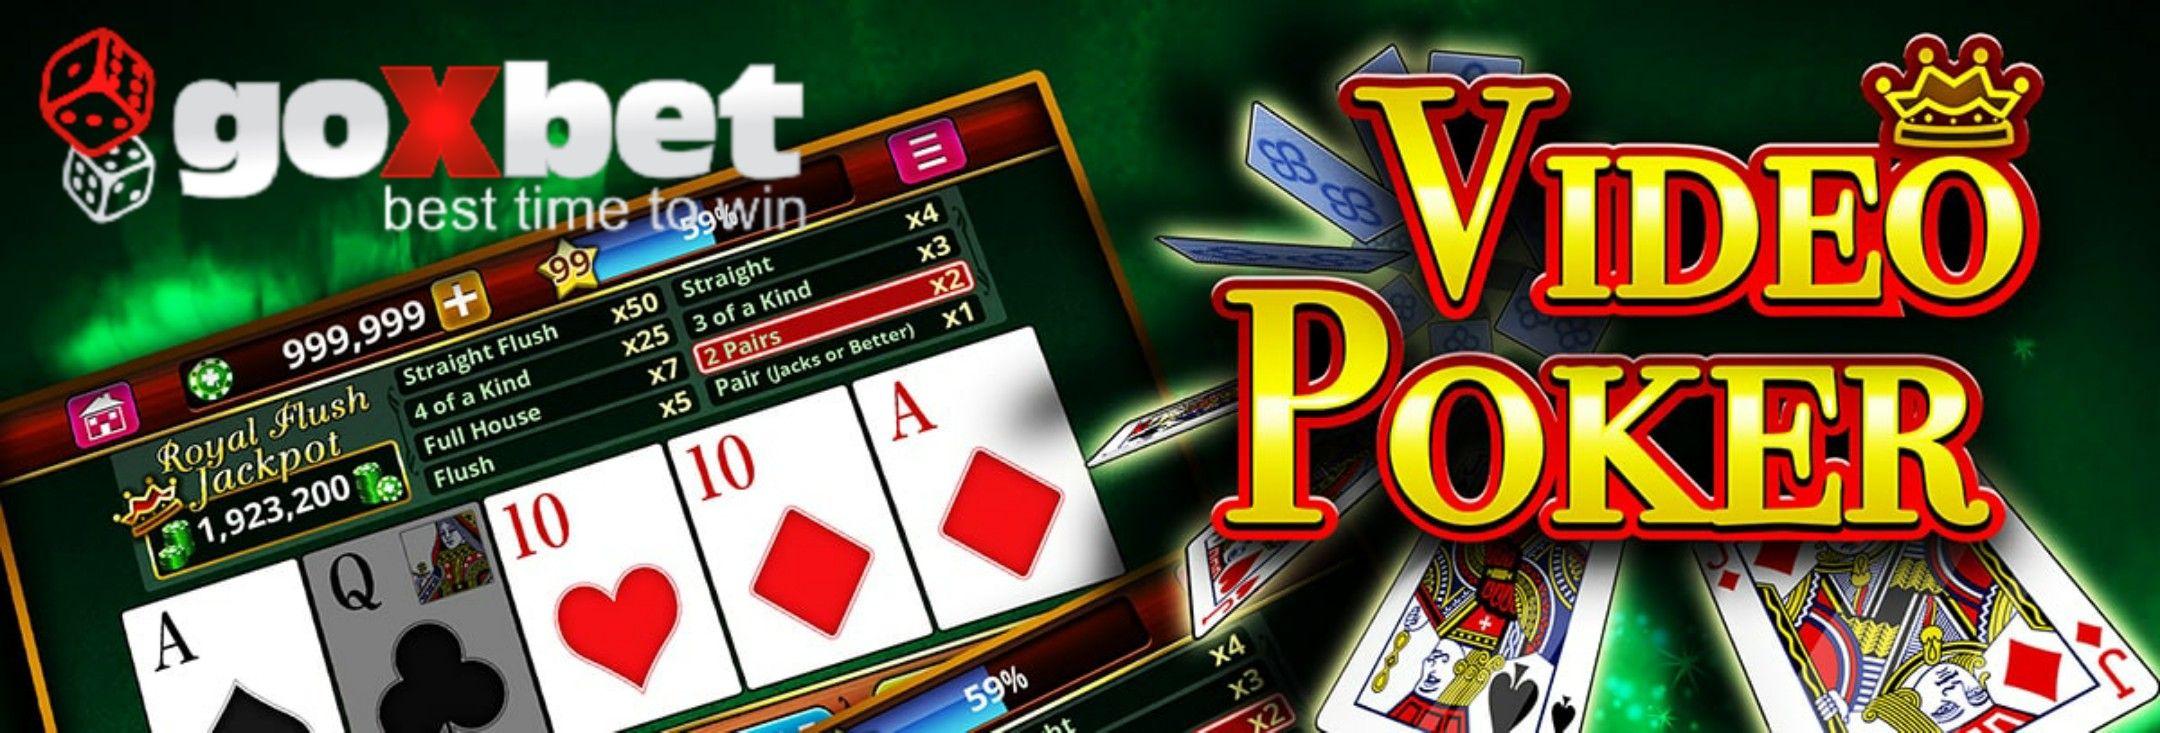 Видео покер онлайн играть на деньги тюнер голден интерстар 7700